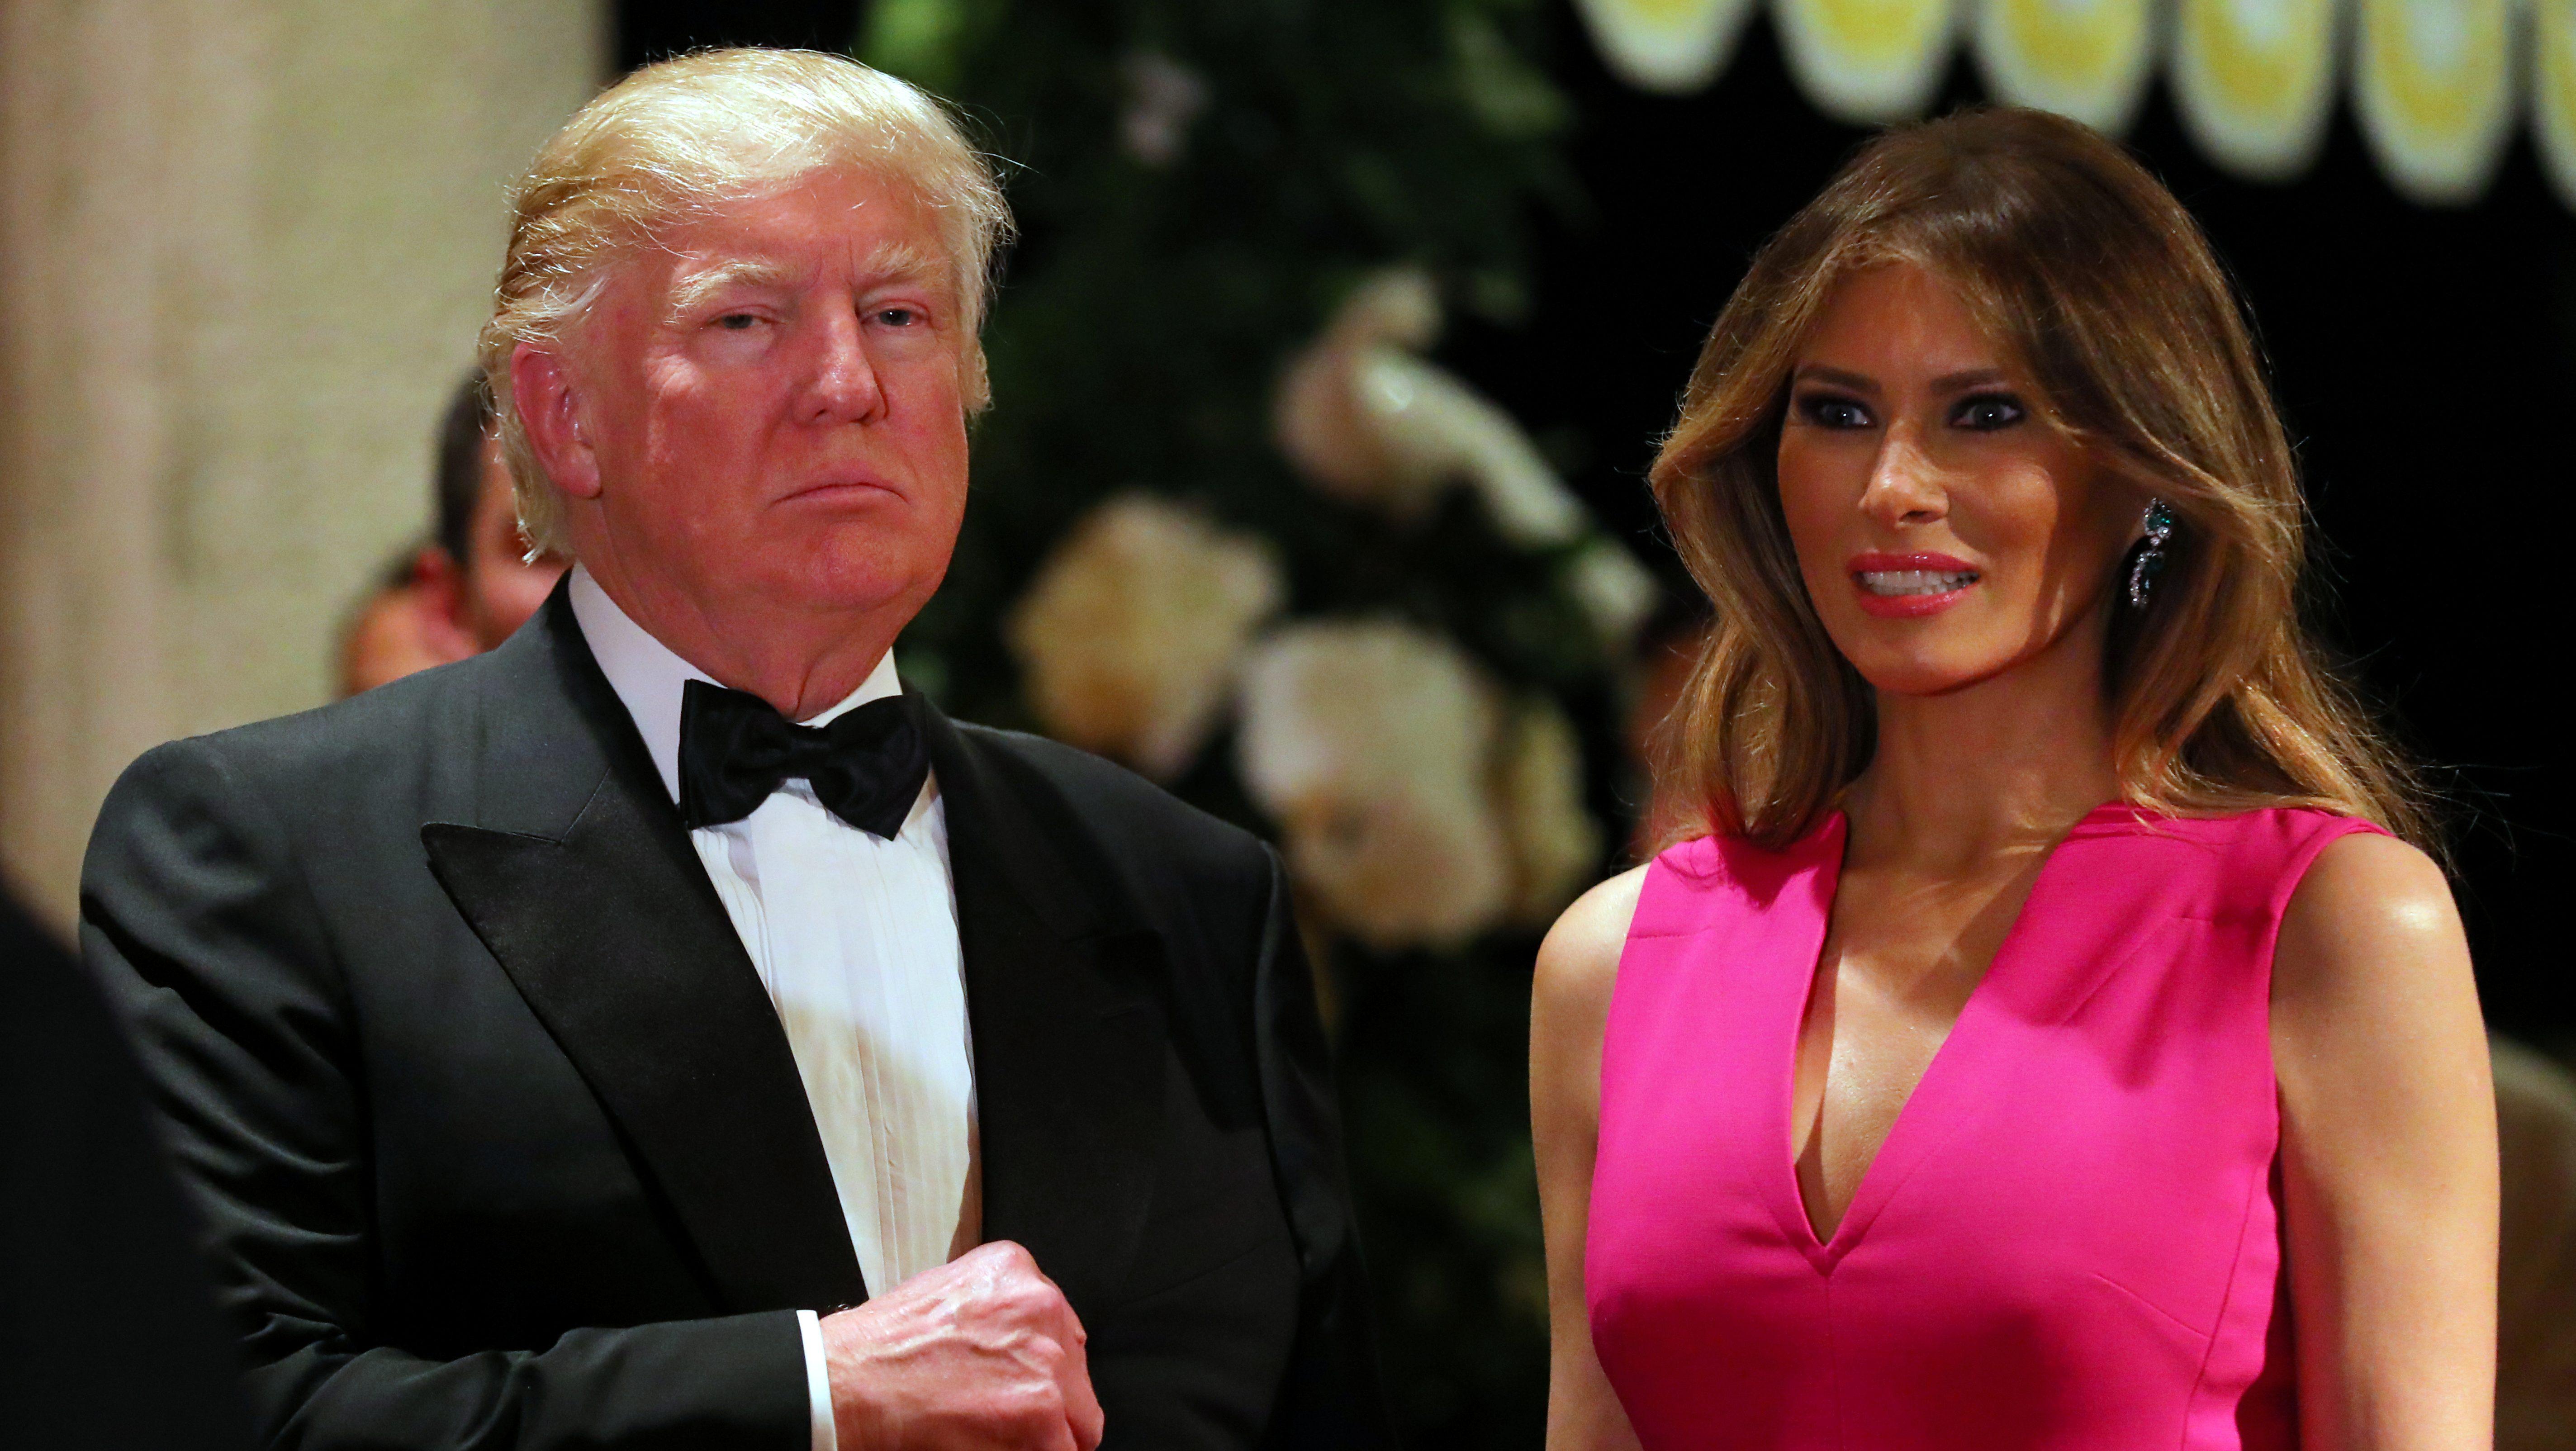 U.S. President Donald Trump and First Lady Melania Trump attend the 60th Annual Red Cross Gala at Mar-a-Lago club in Palm Beach, Florida, U.S., February 4, 2017.